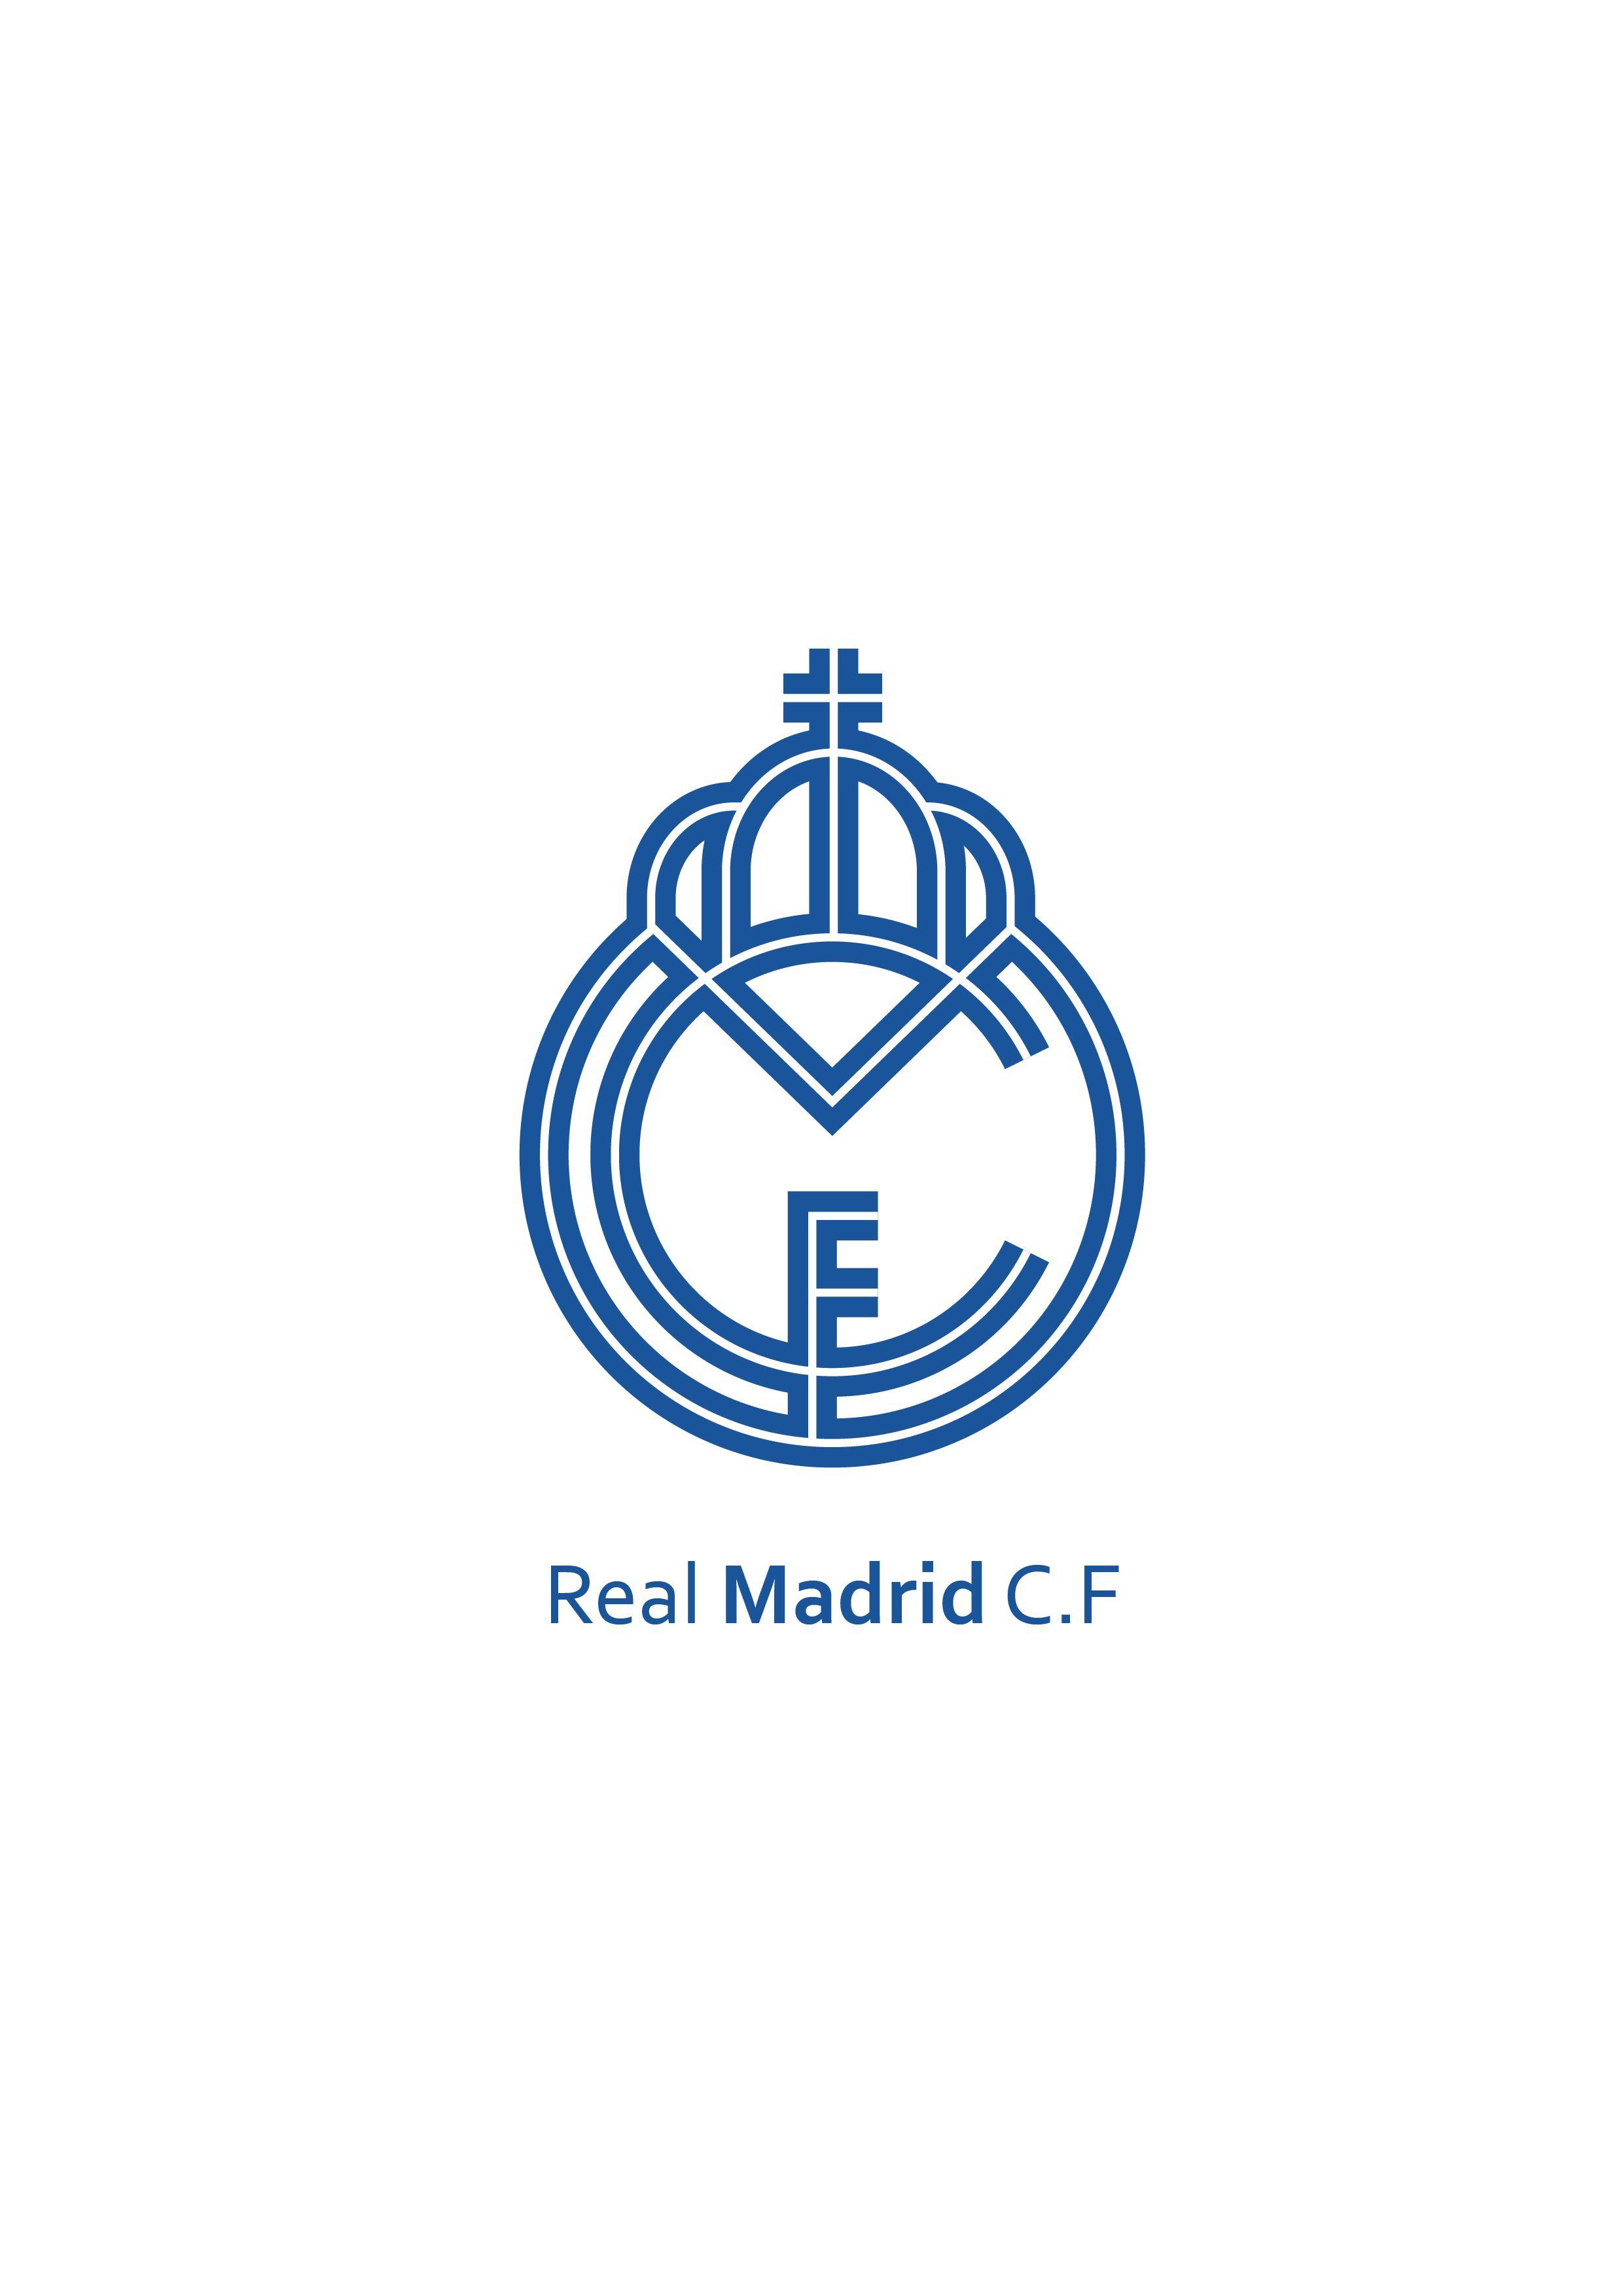 Pin Oleh John Nguyễn Di Real Madrid Di 2020